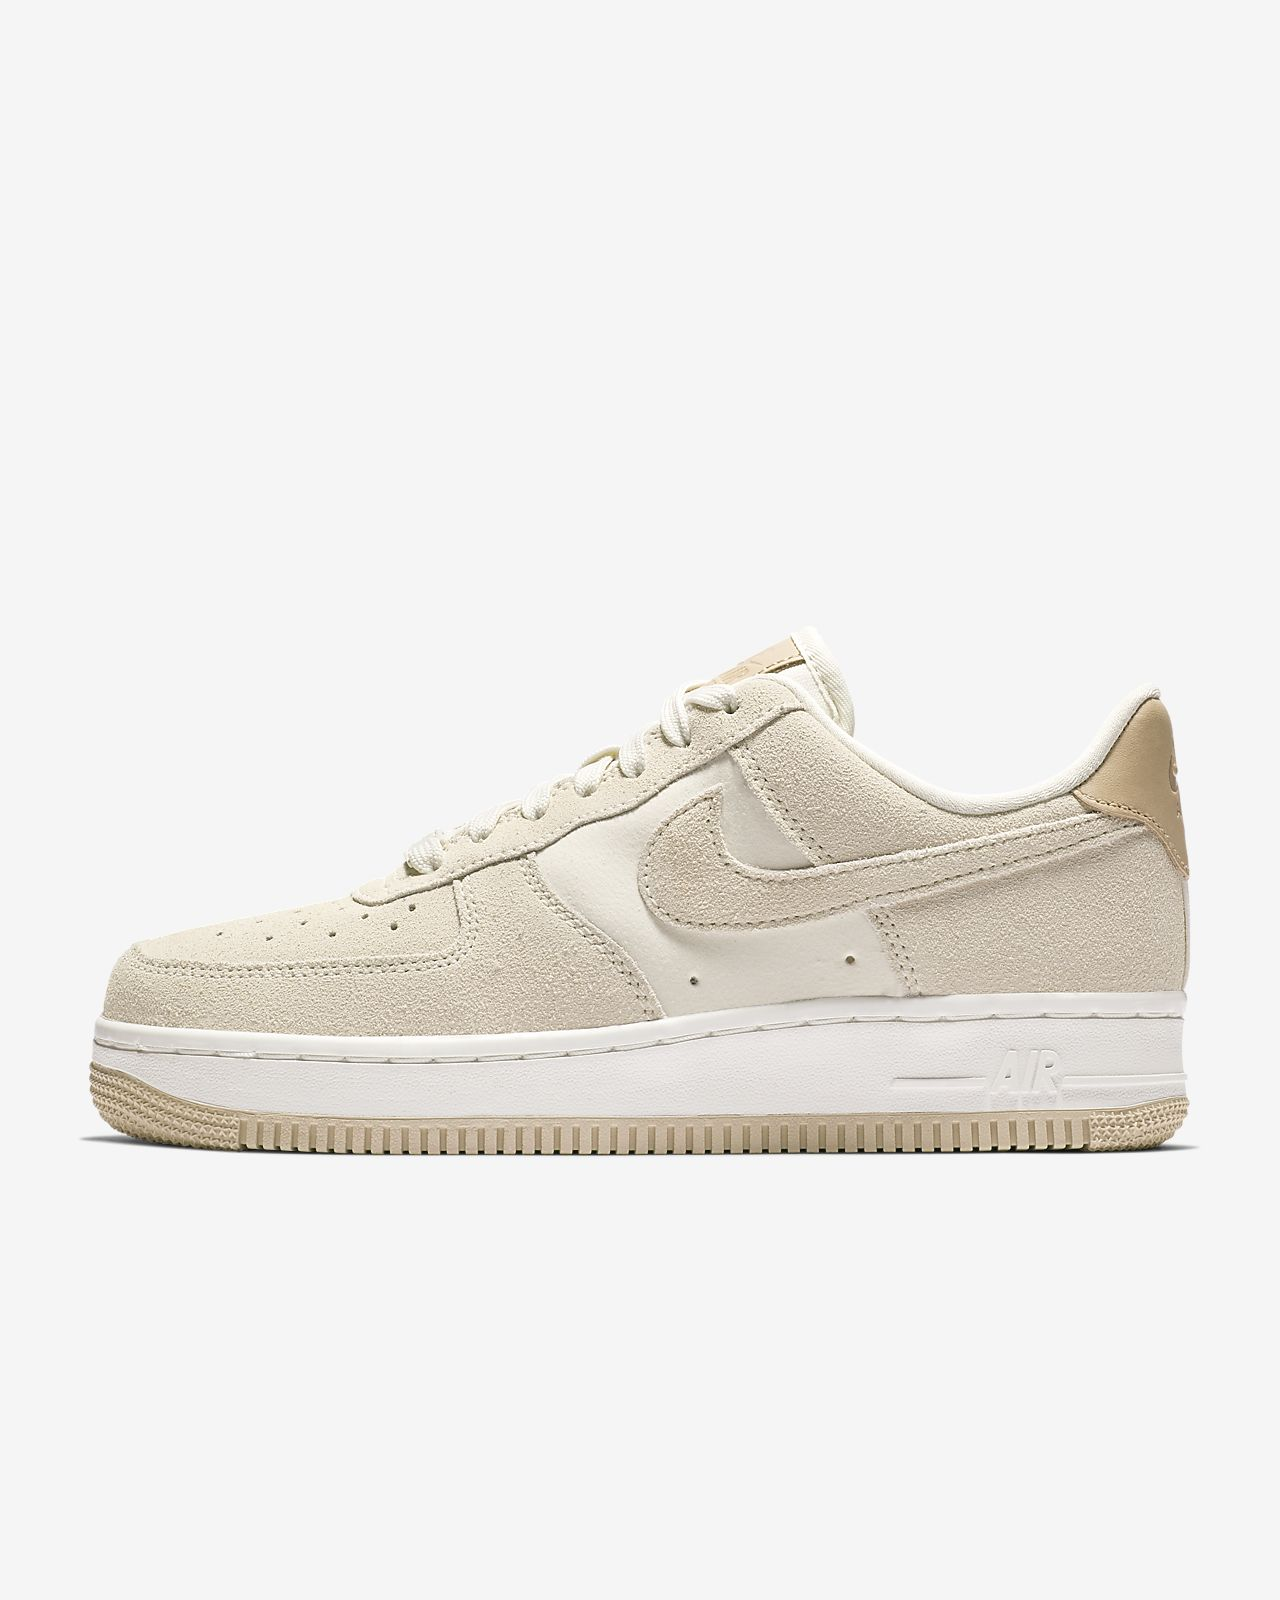 Nike 07 1 Low Air Force Premium kPOiXZuT